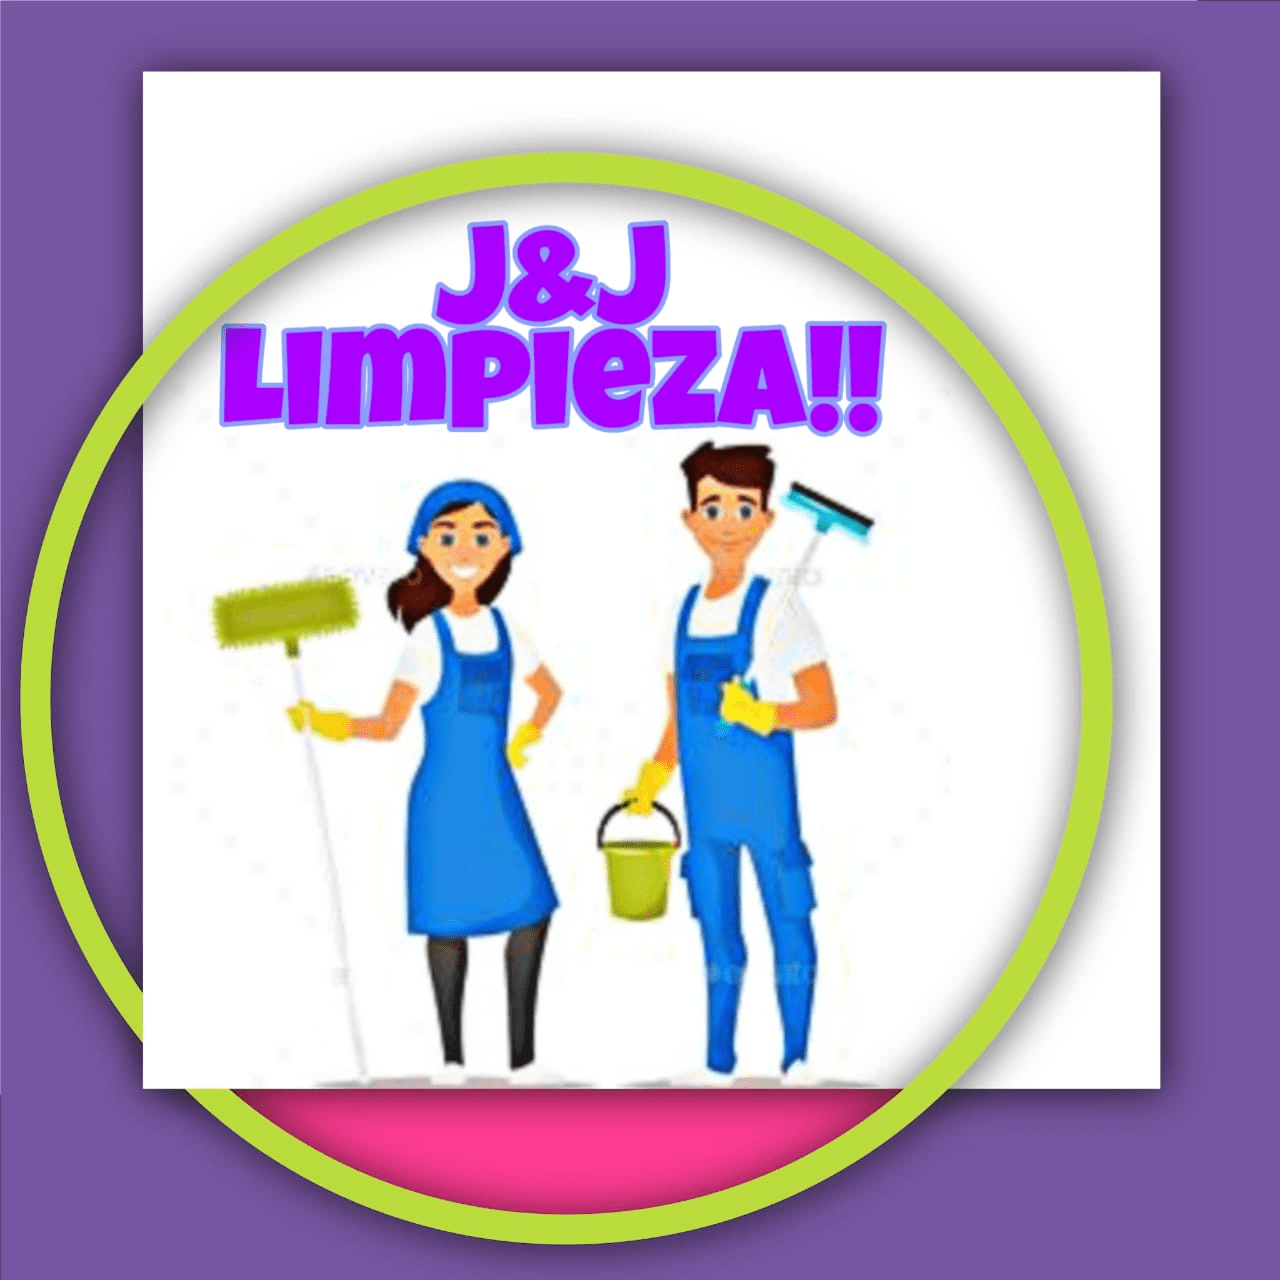 J & J Limpieza